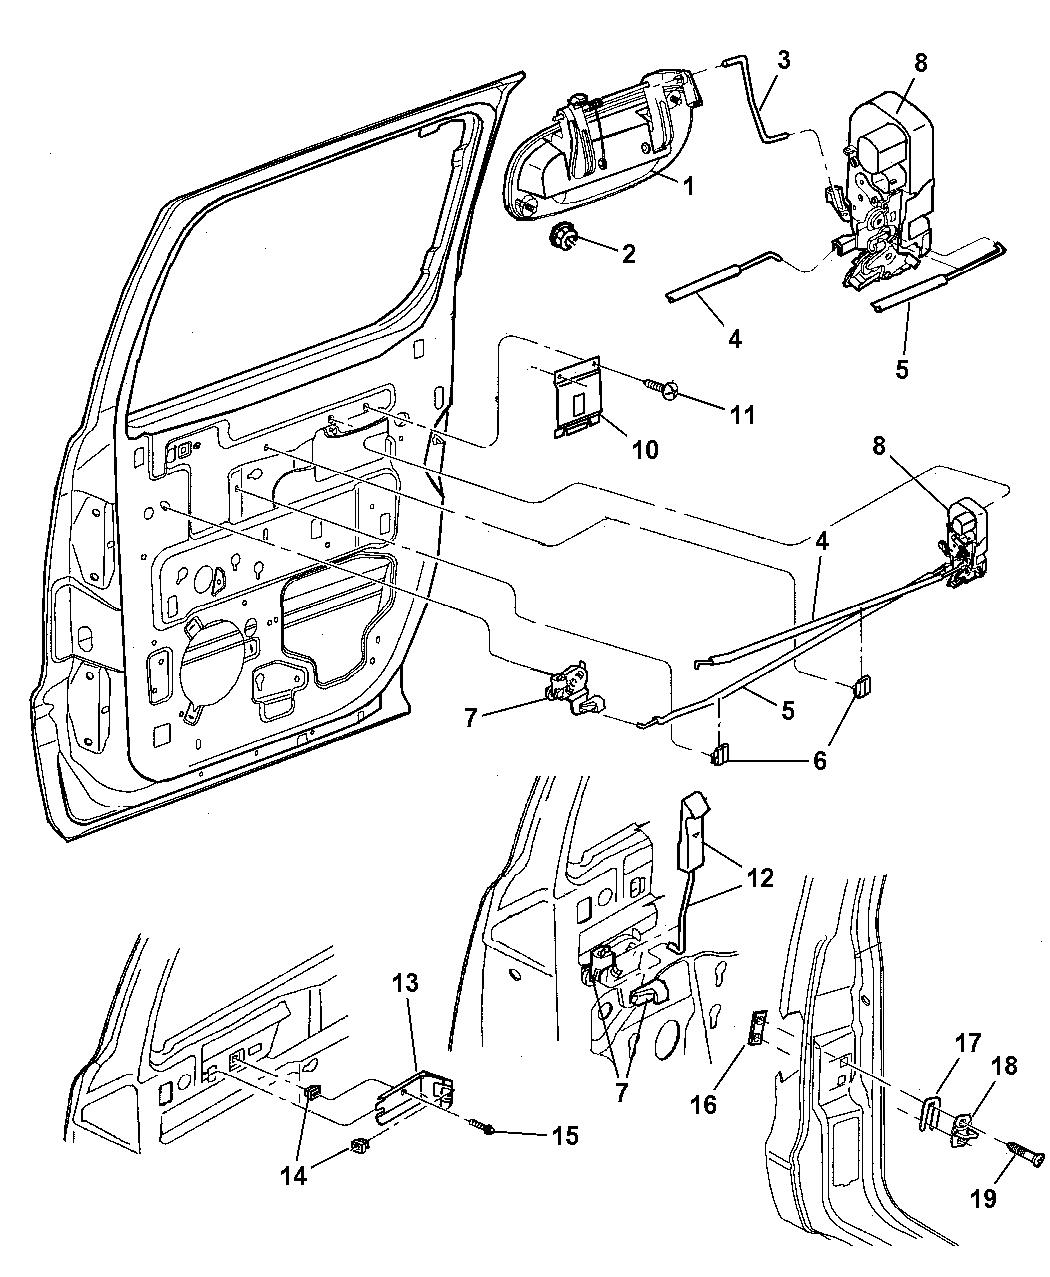 2000 Dodge Durango Door Lock Diagram Wiring Diagram Cup Browse A Cup Browse A Bowlingronta It